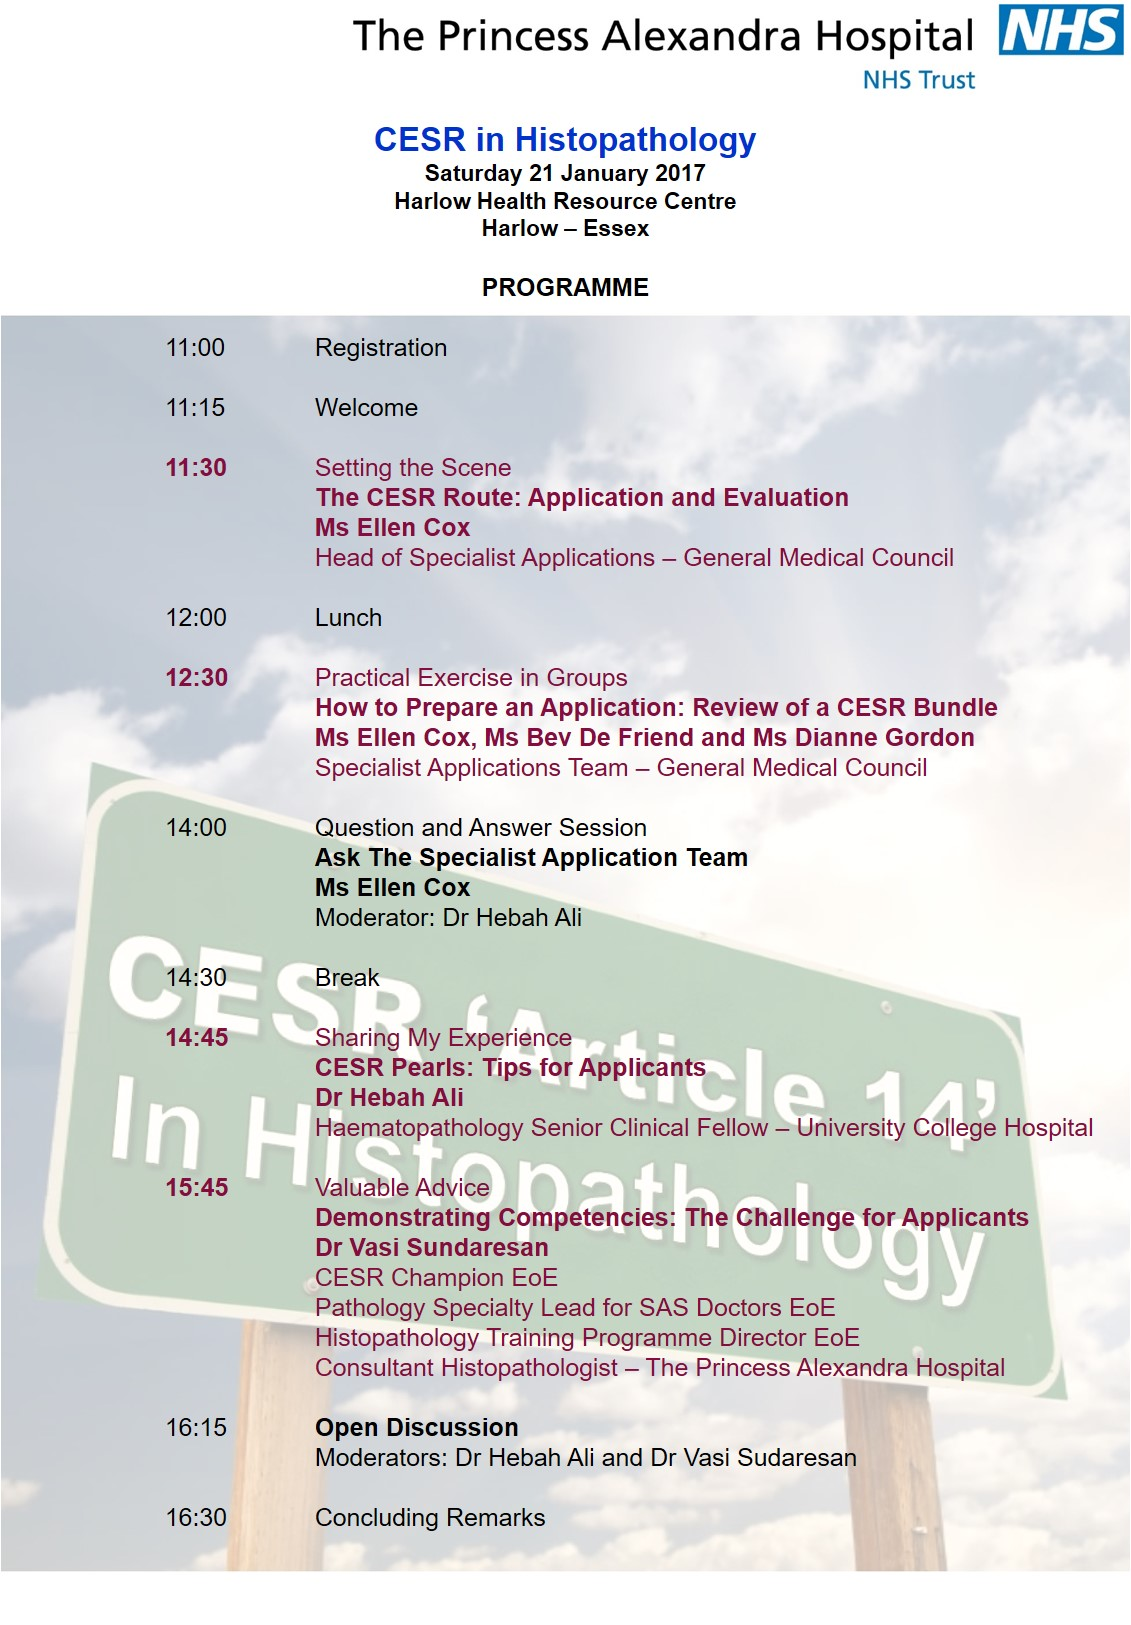 CESR in Histopathology Programme